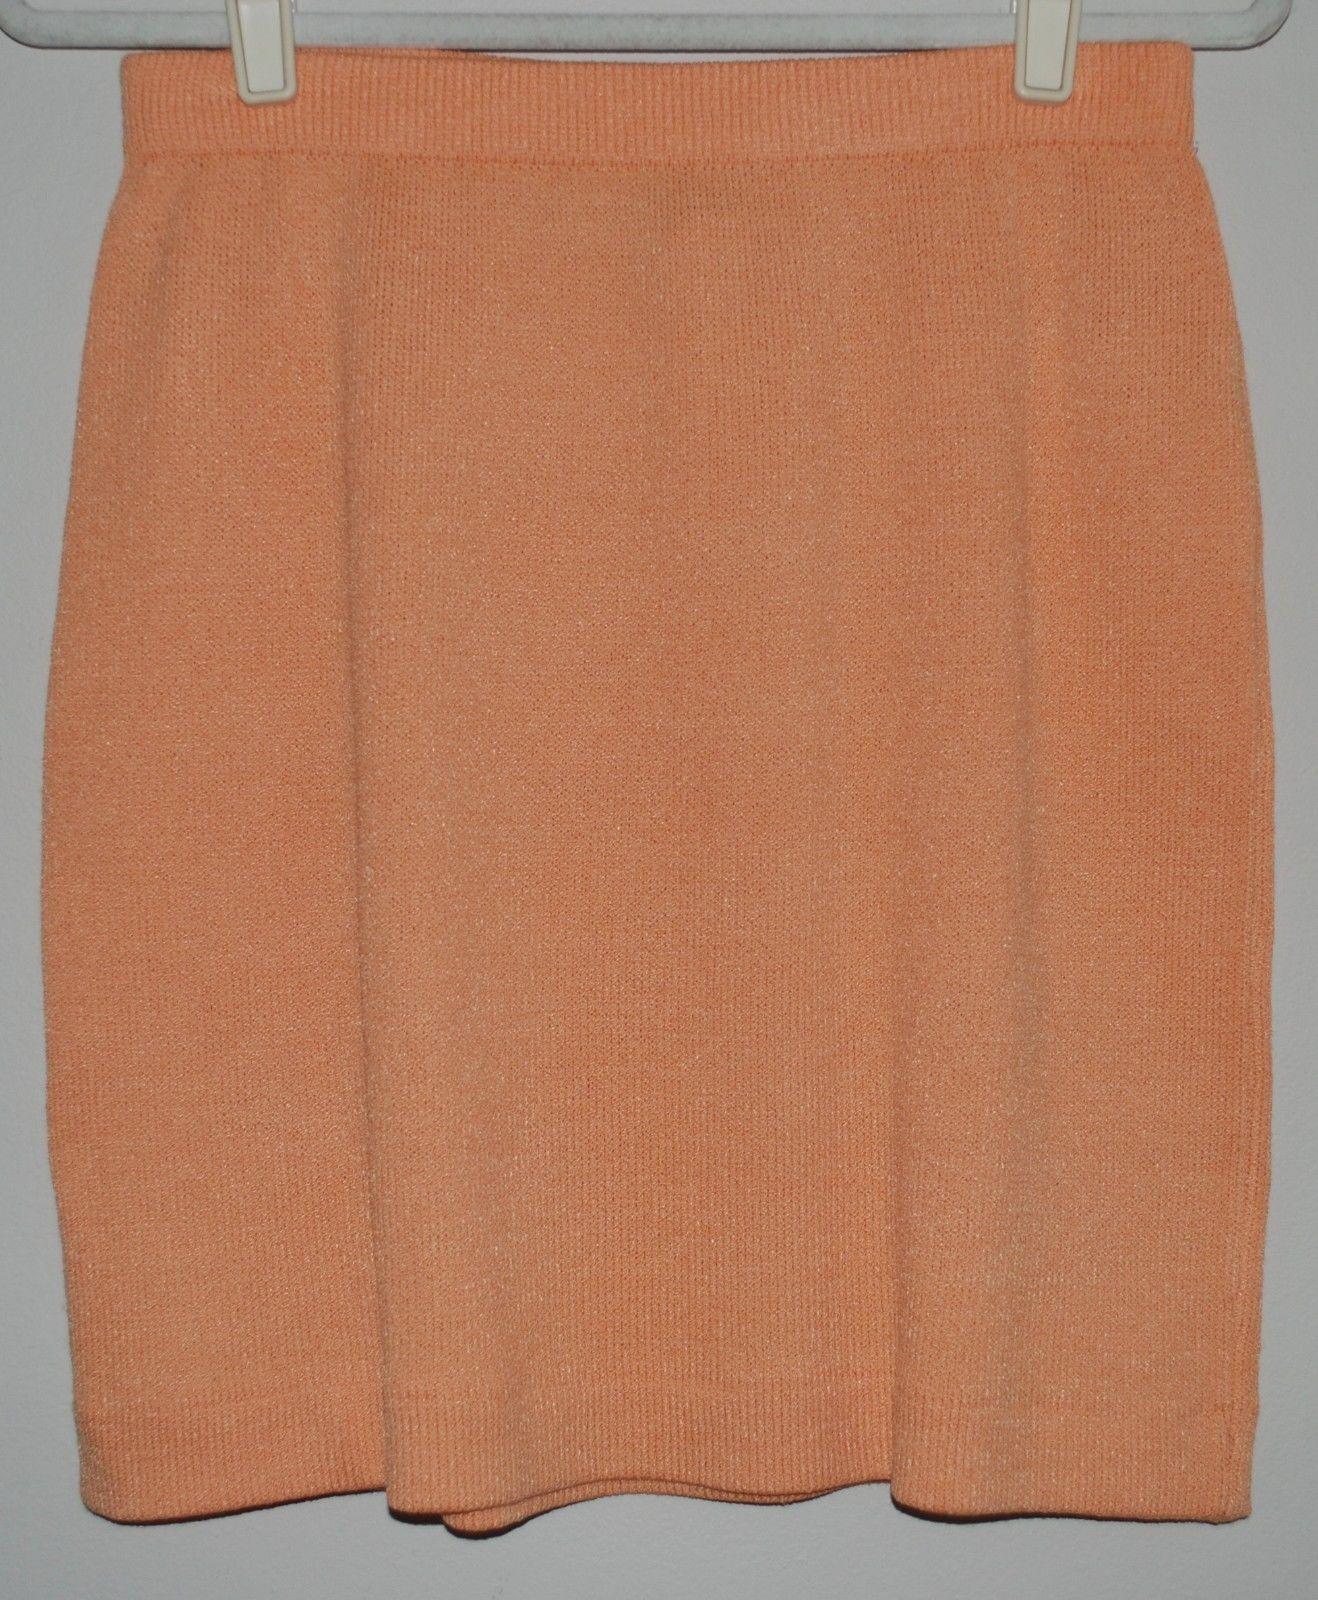 0fb90e717 St. John Collection - Santana Knit Skirt and 18 similar items. 57